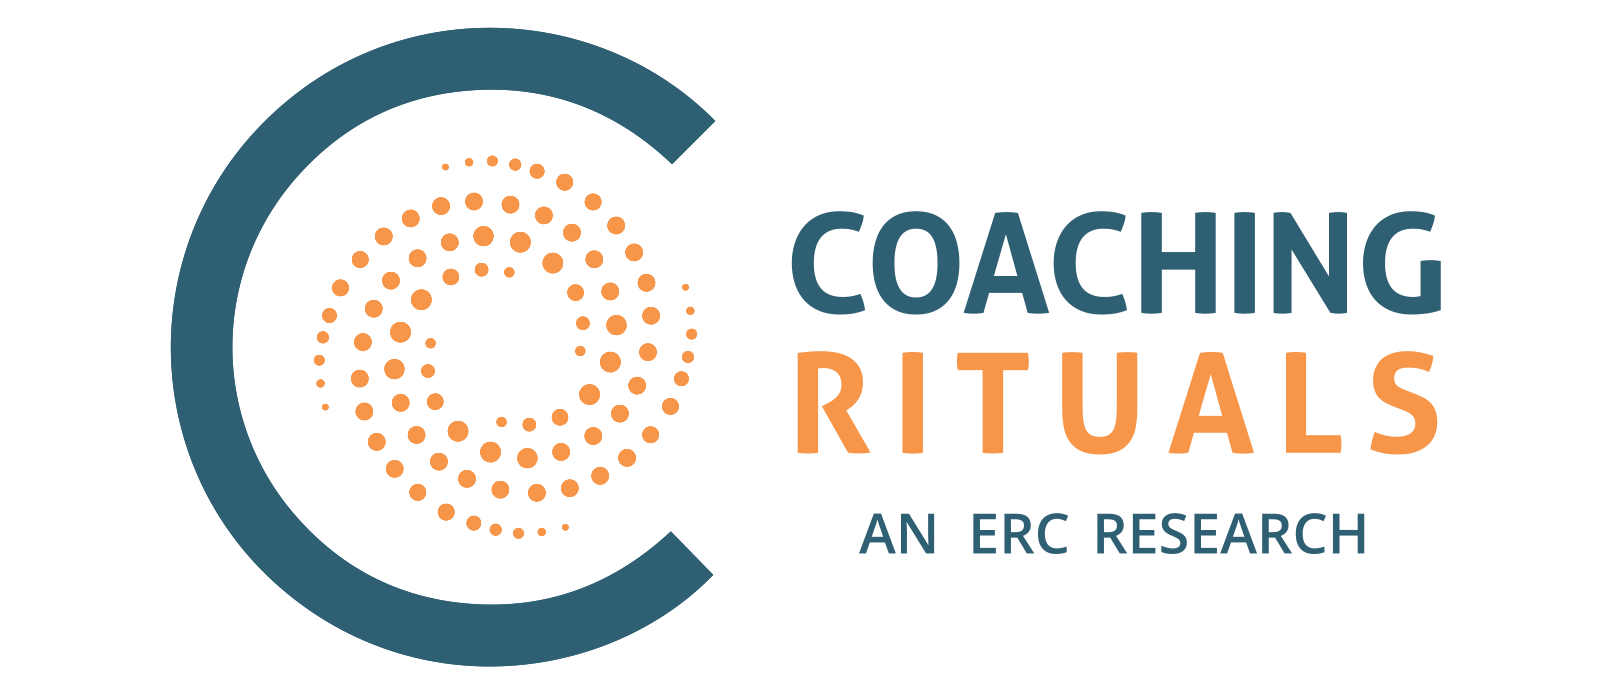 Projet de recherche ERC CoachingRituals